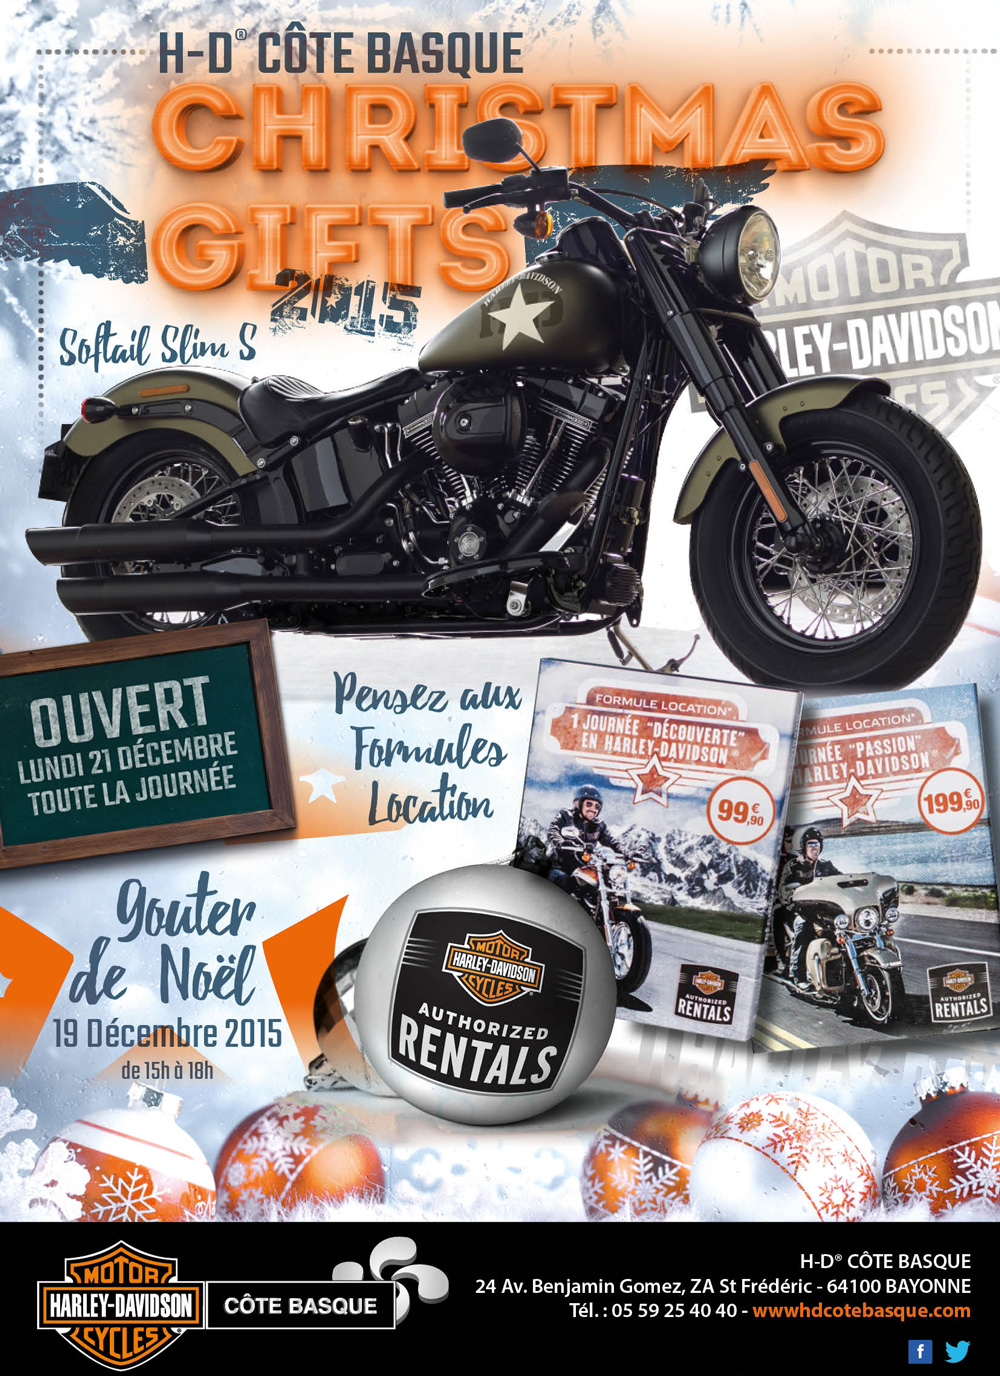 Christmas Gifts | Concessionnaire Officiel Harley-Davidson® Côte Basque